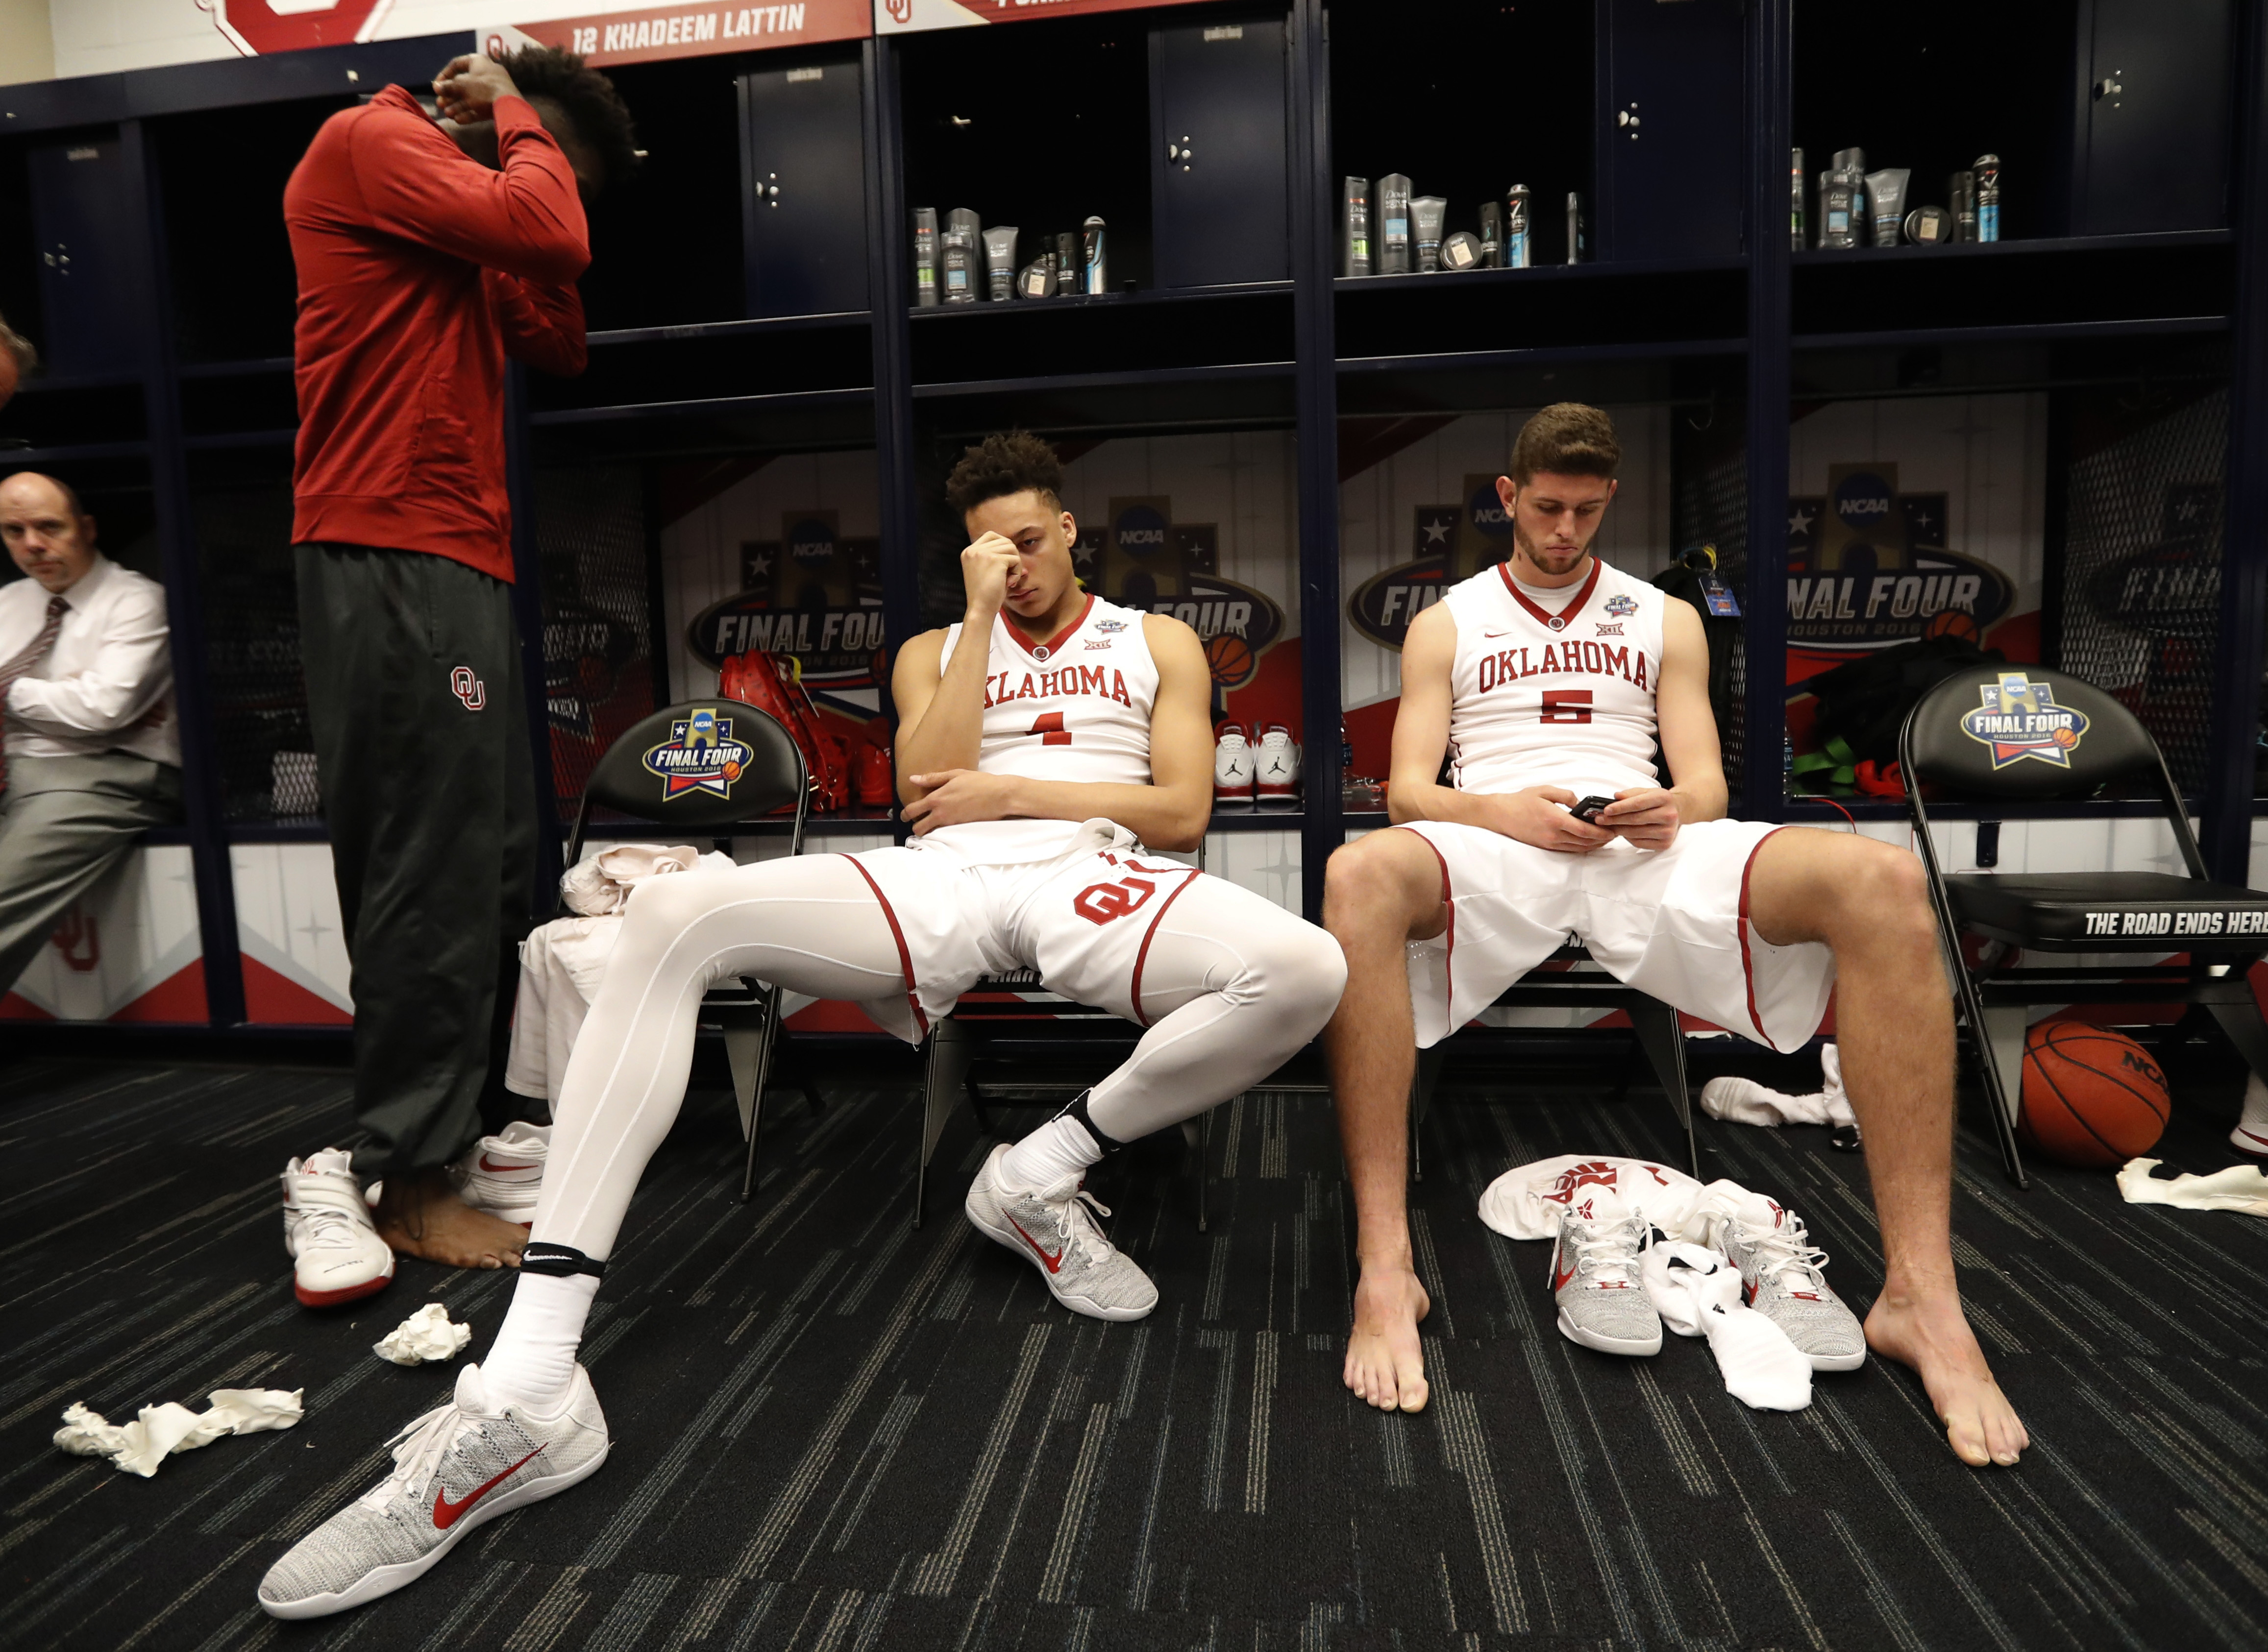 Oklahoma's Jamuni McNeace (4) and Matt Freeman (5) sit in the locker room after the NCAA Final Four tournament college basketball semifinal game against Villanova, Saturday, April 2, 2016, in Houston. Villanova won 95-51. (AP Photo/Eric Gay)